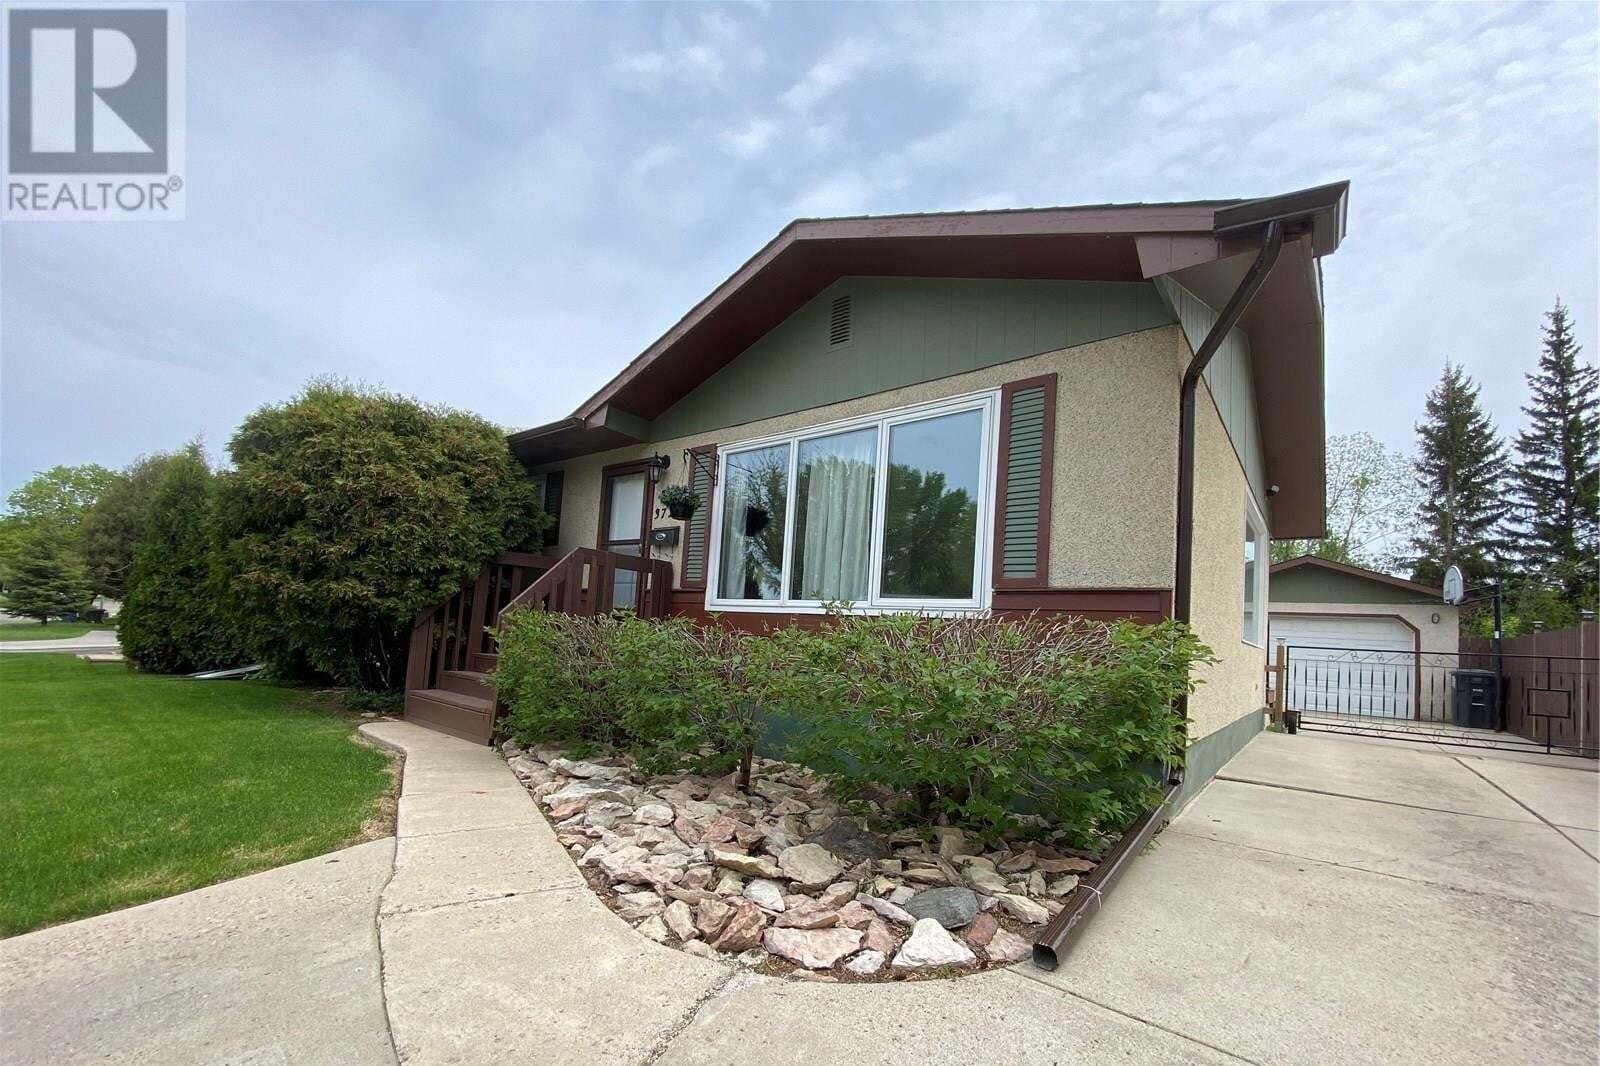 House for sale at 3727 Fairlight Dr Saskatoon Saskatchewan - MLS: SK810273